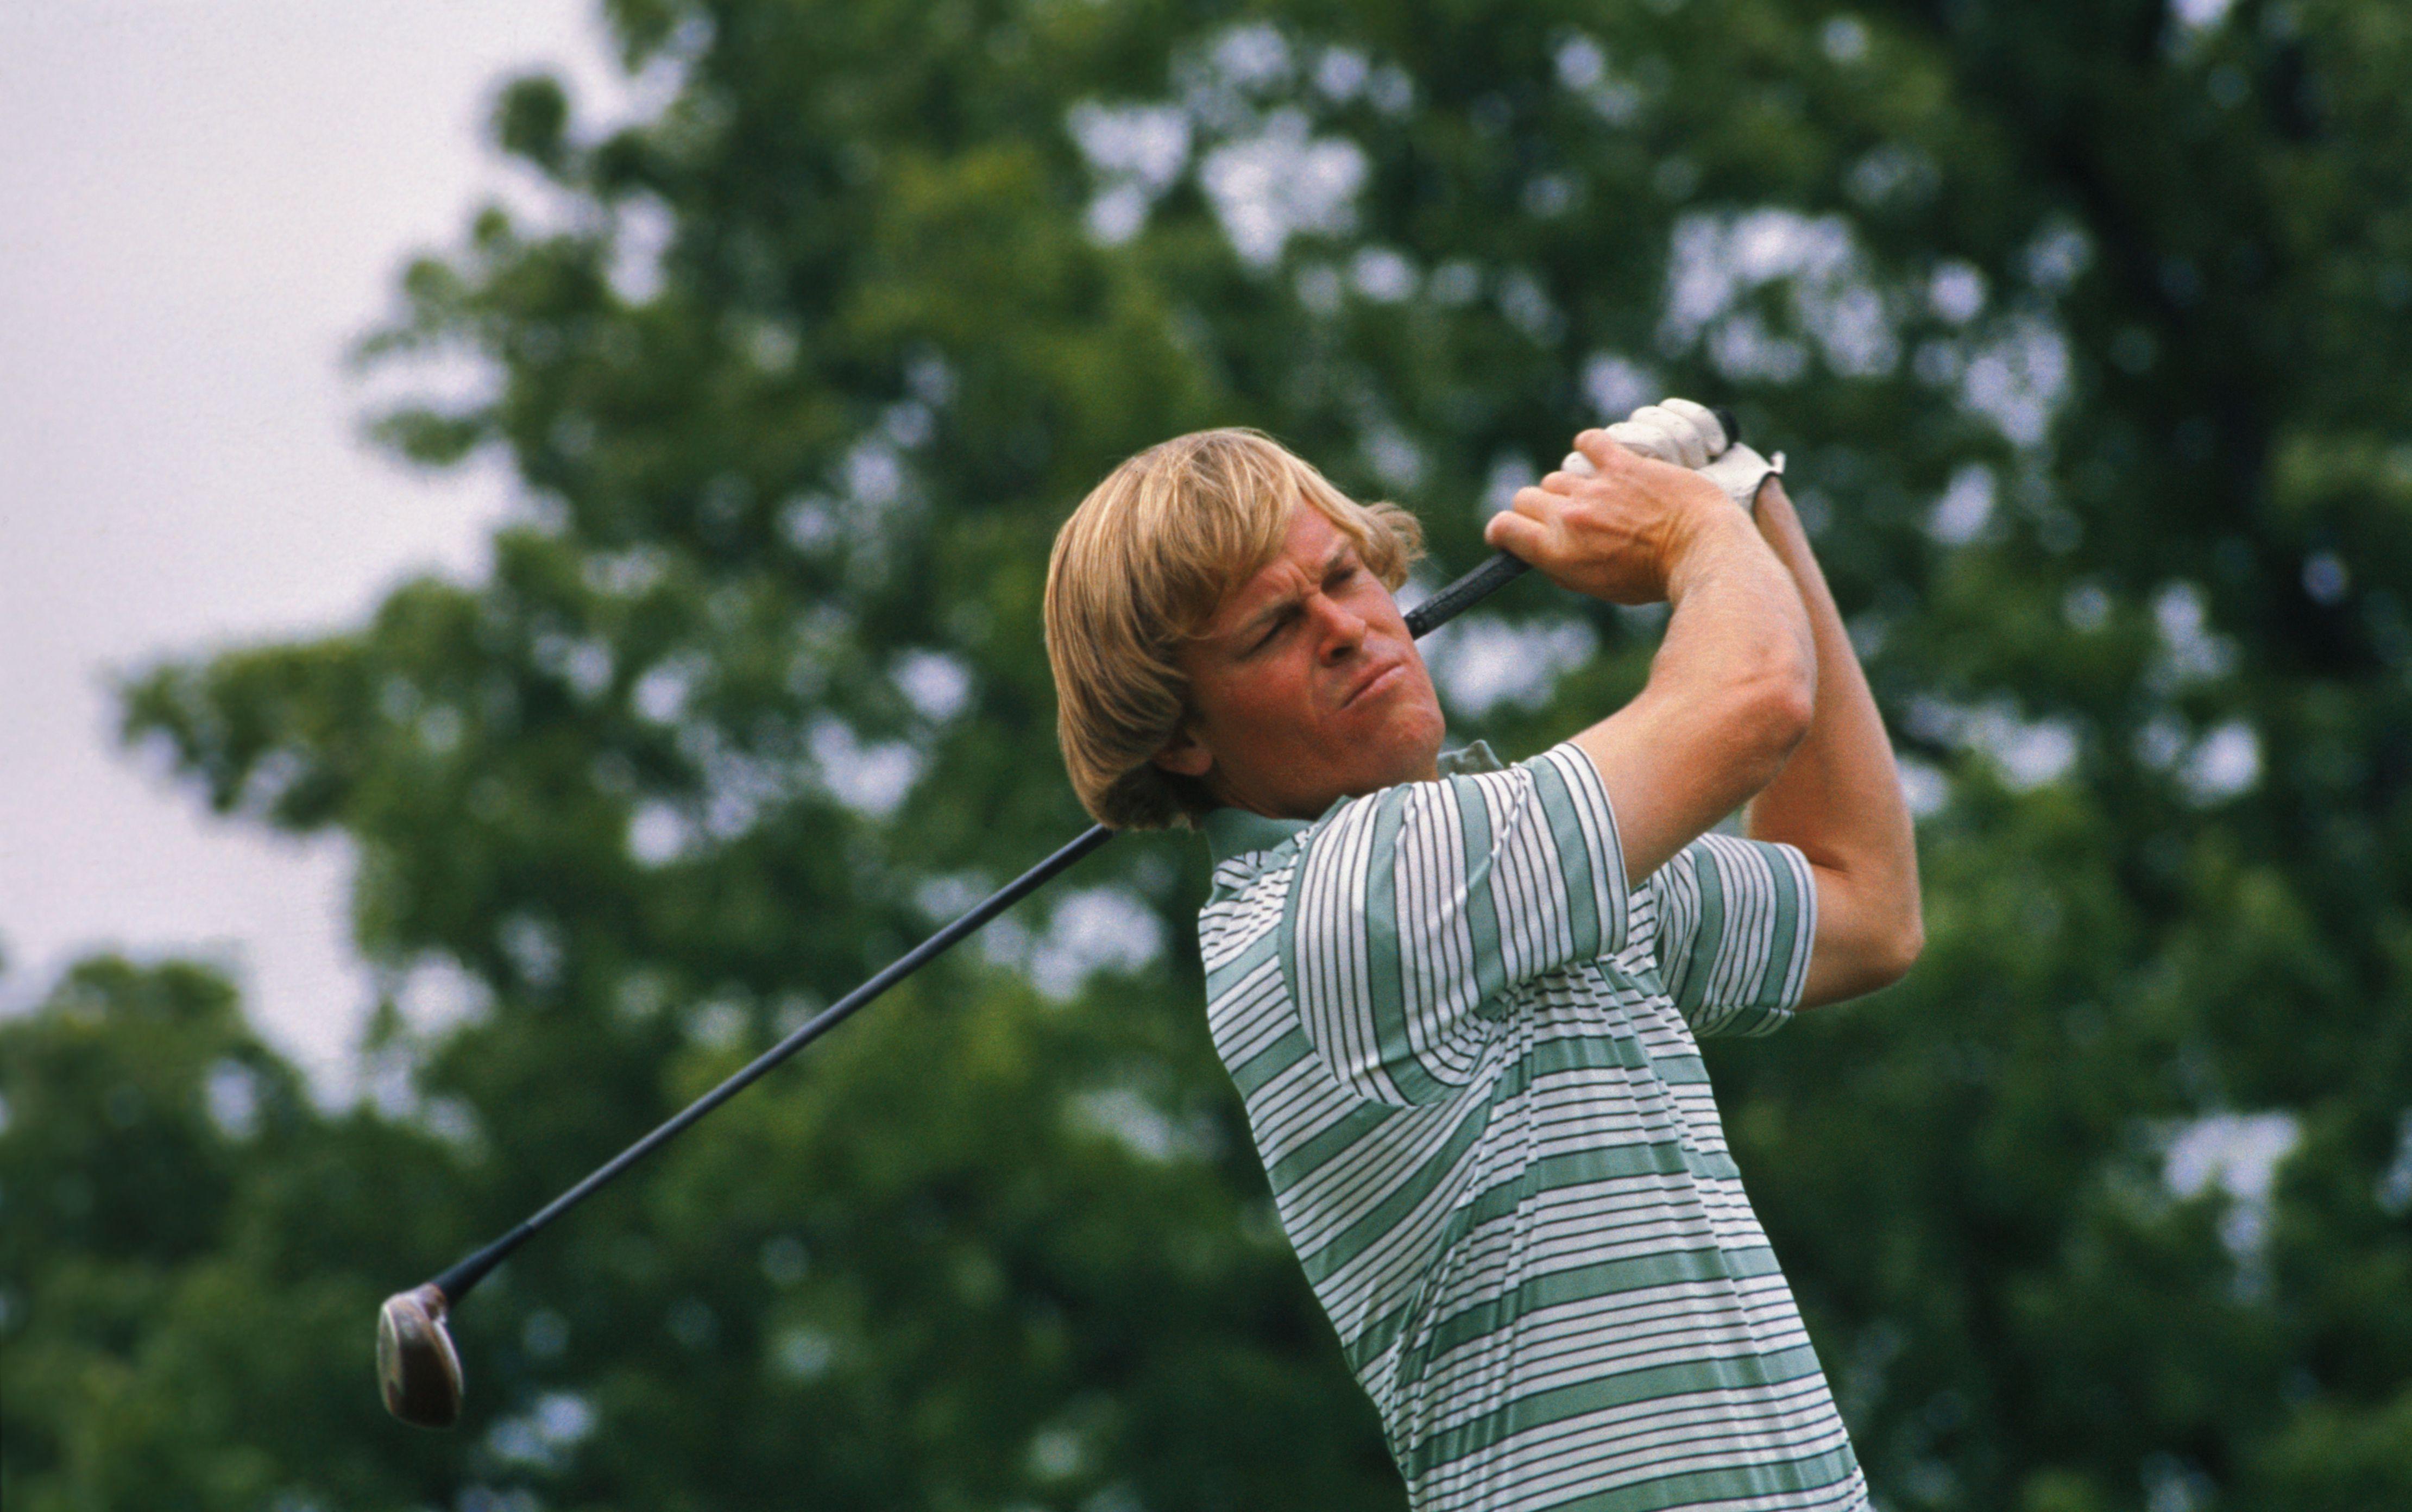 Golfer Johnny Miller in 1976